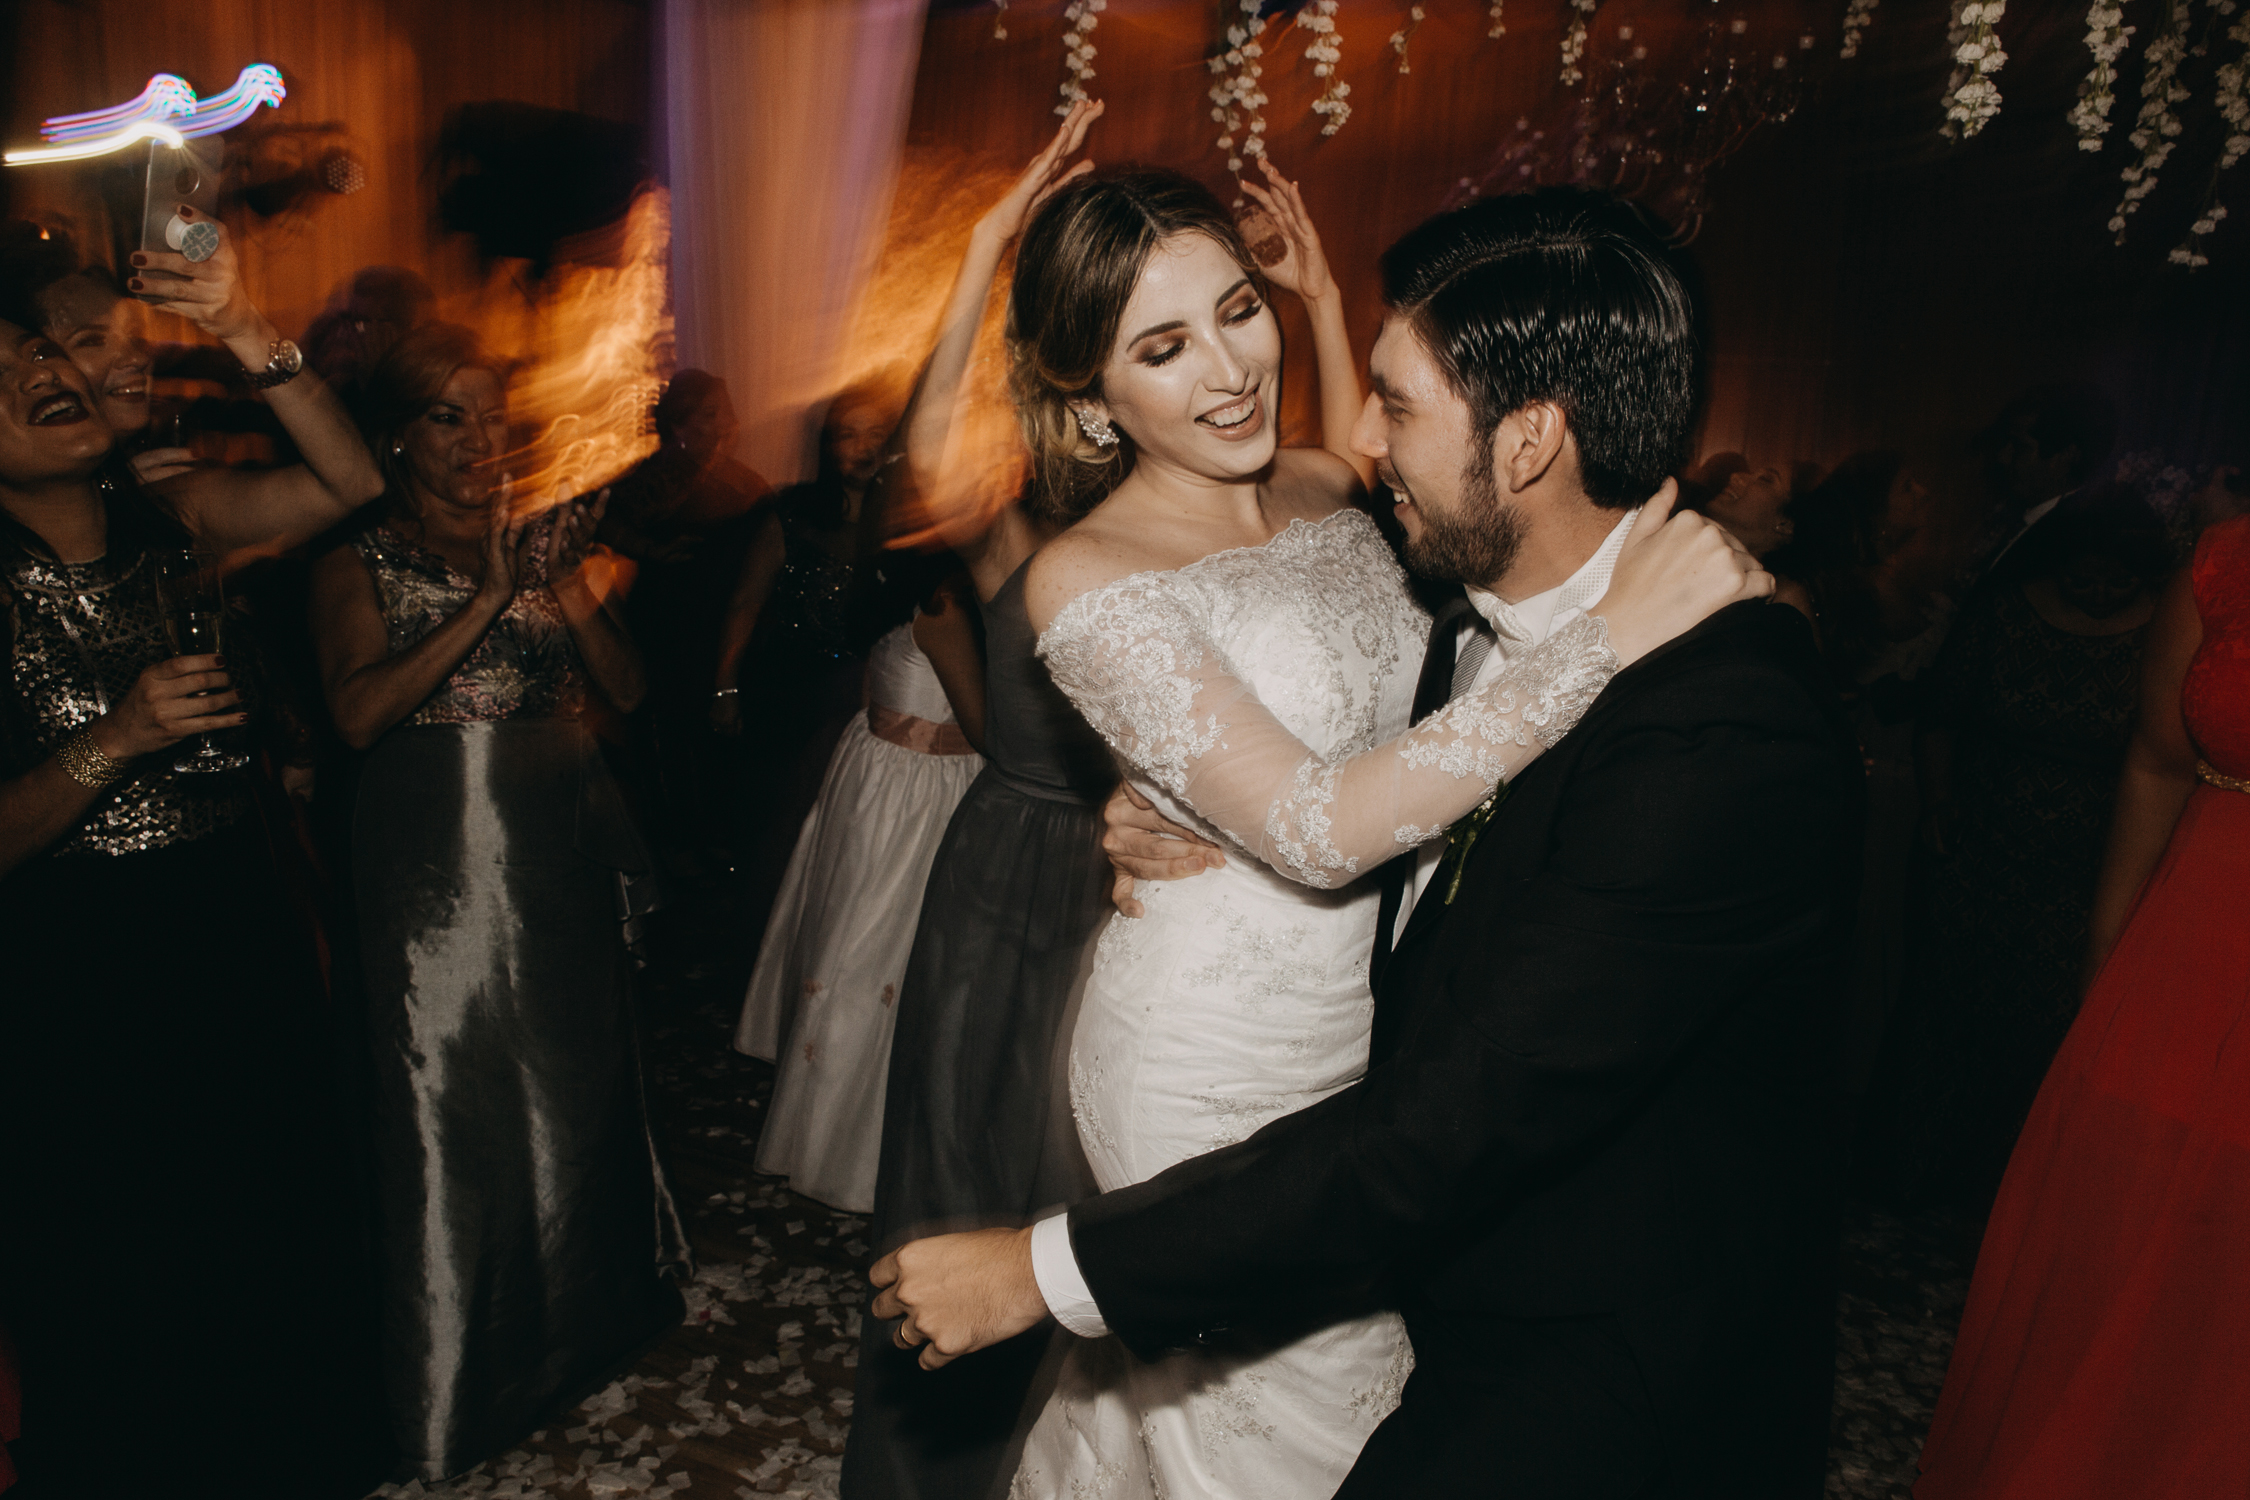 Michelle-Agurto-Fotografia-Bodas-Ecuador-Destination-Wedding-Photographer-Vicky-Javier-250.JPG